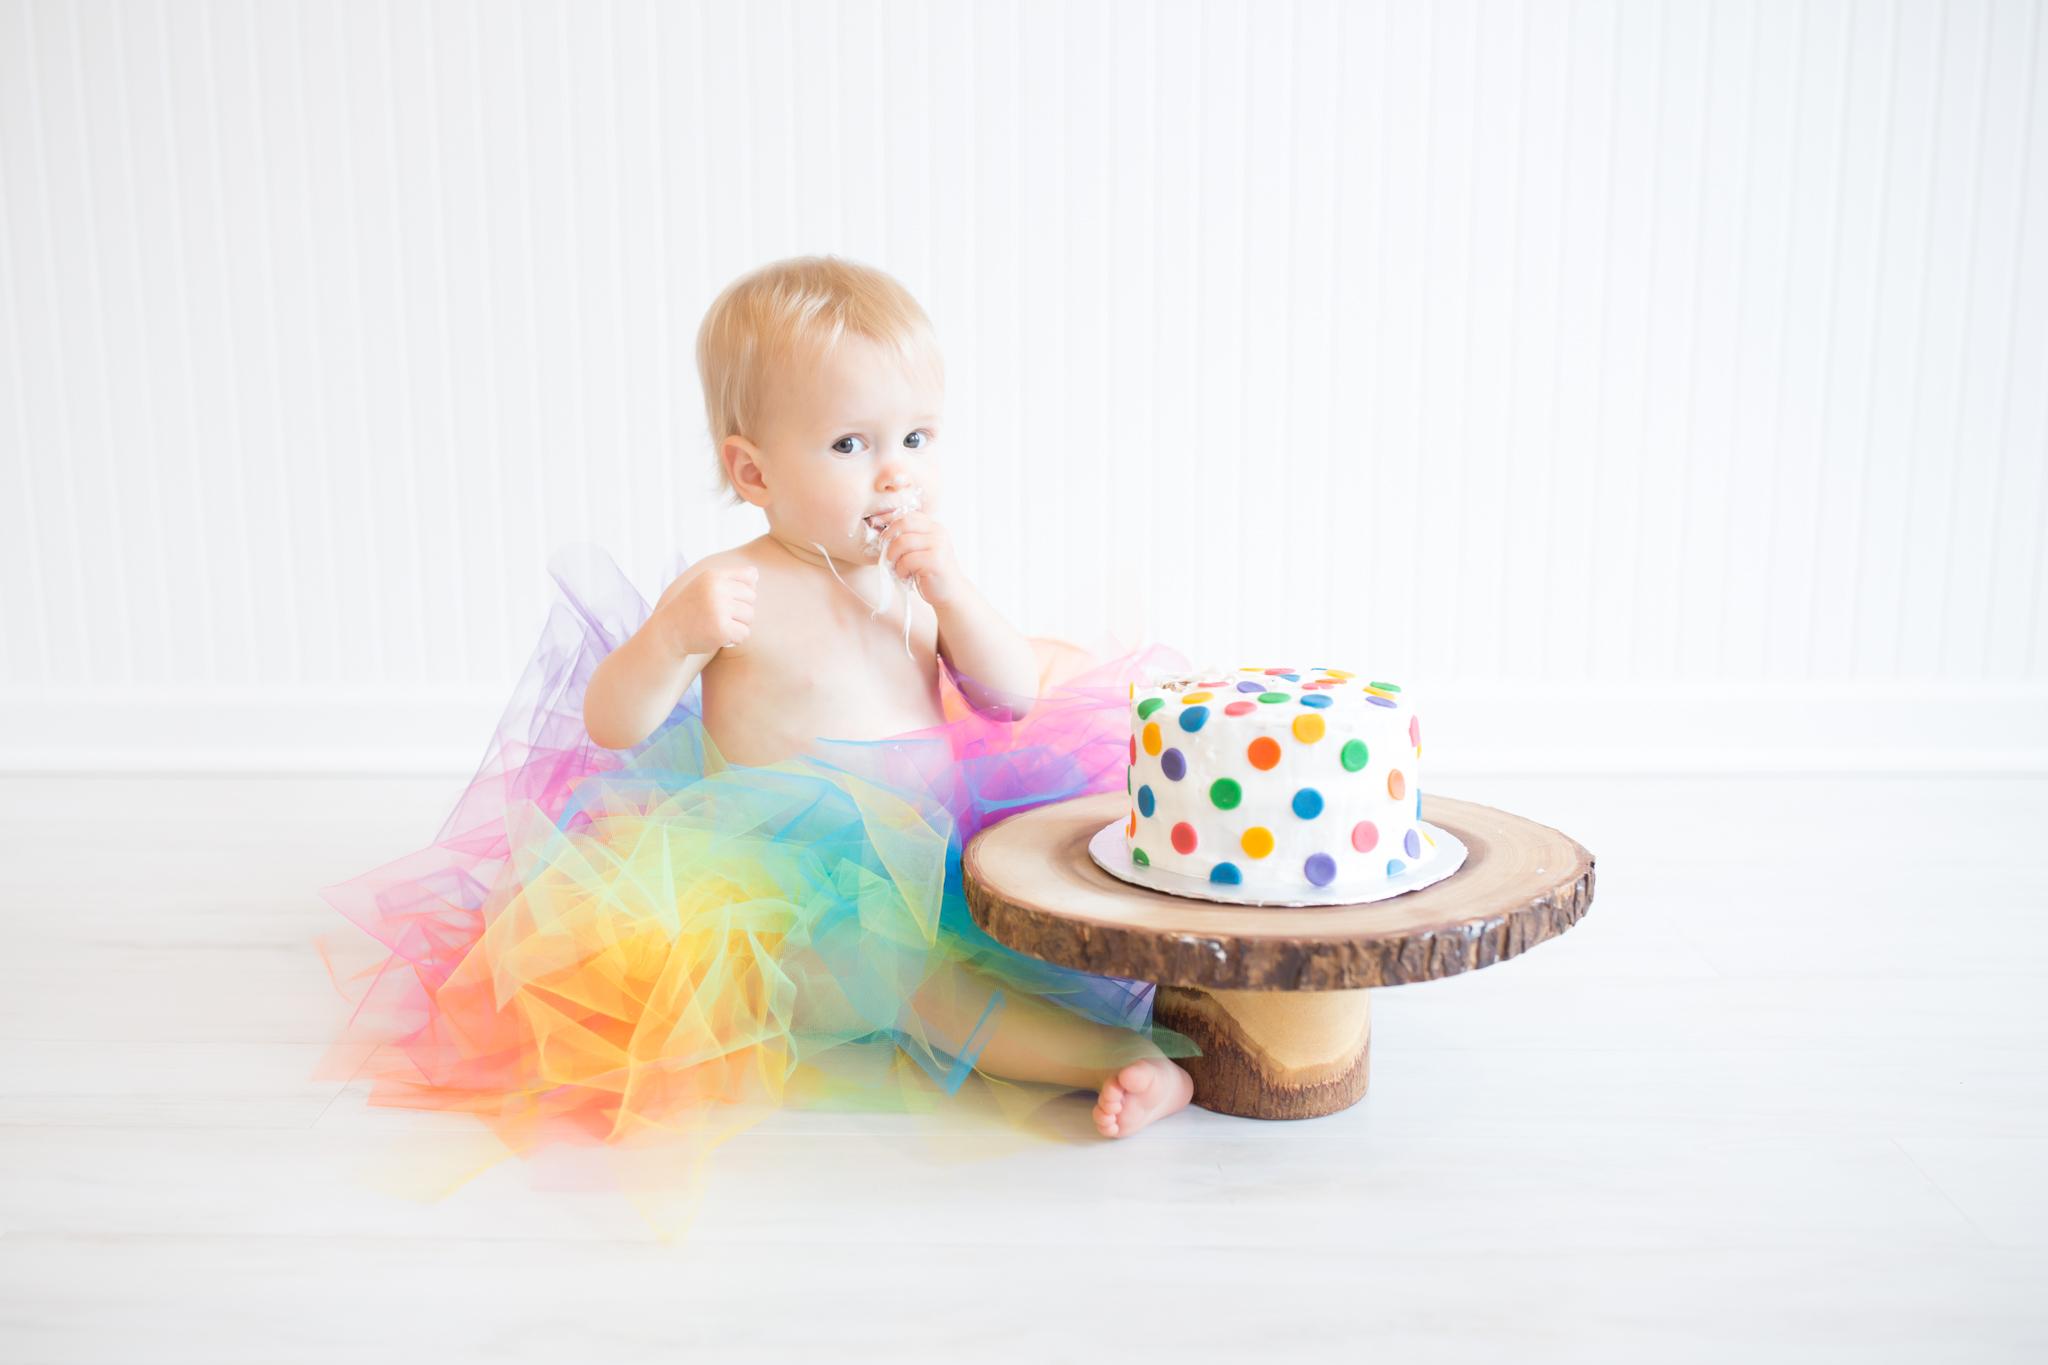 Milestone cake smash Newborn Studio Session | Cara Peterson Photography Rockford IL-11.jpg